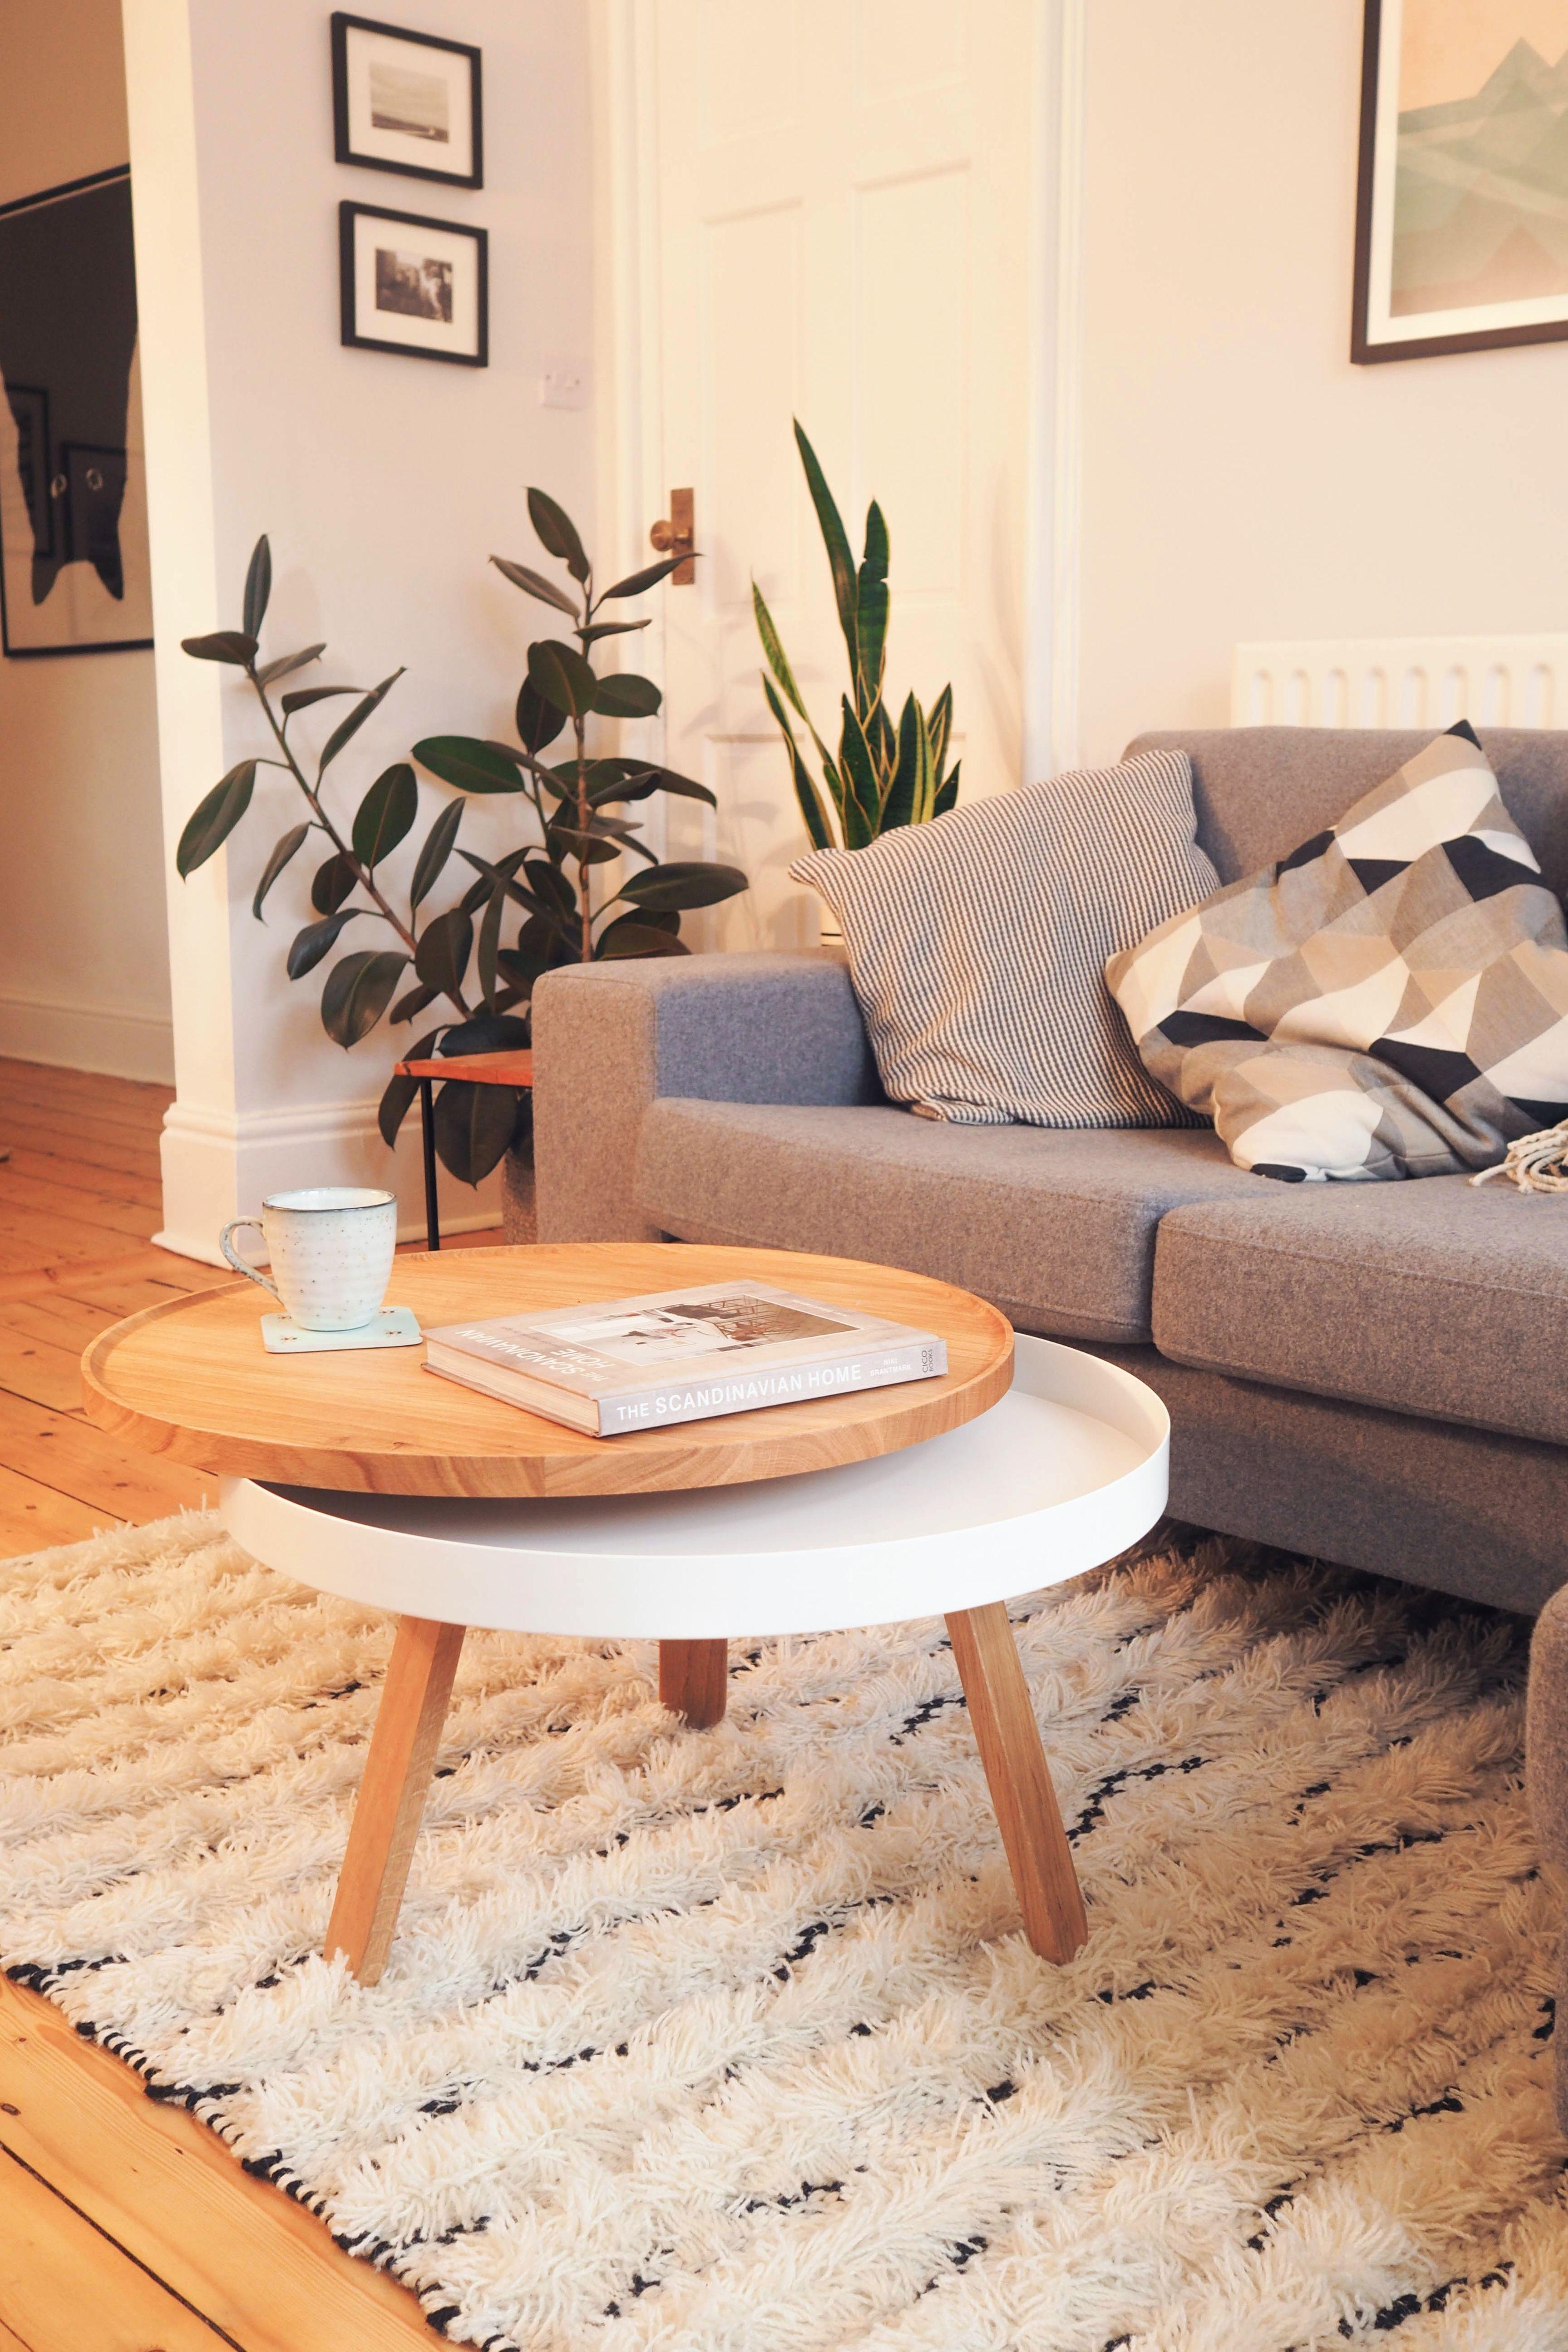 Oak Coffee Table Coffee Table Coffee Table Design Table [ 5000 x 3334 Pixel ]